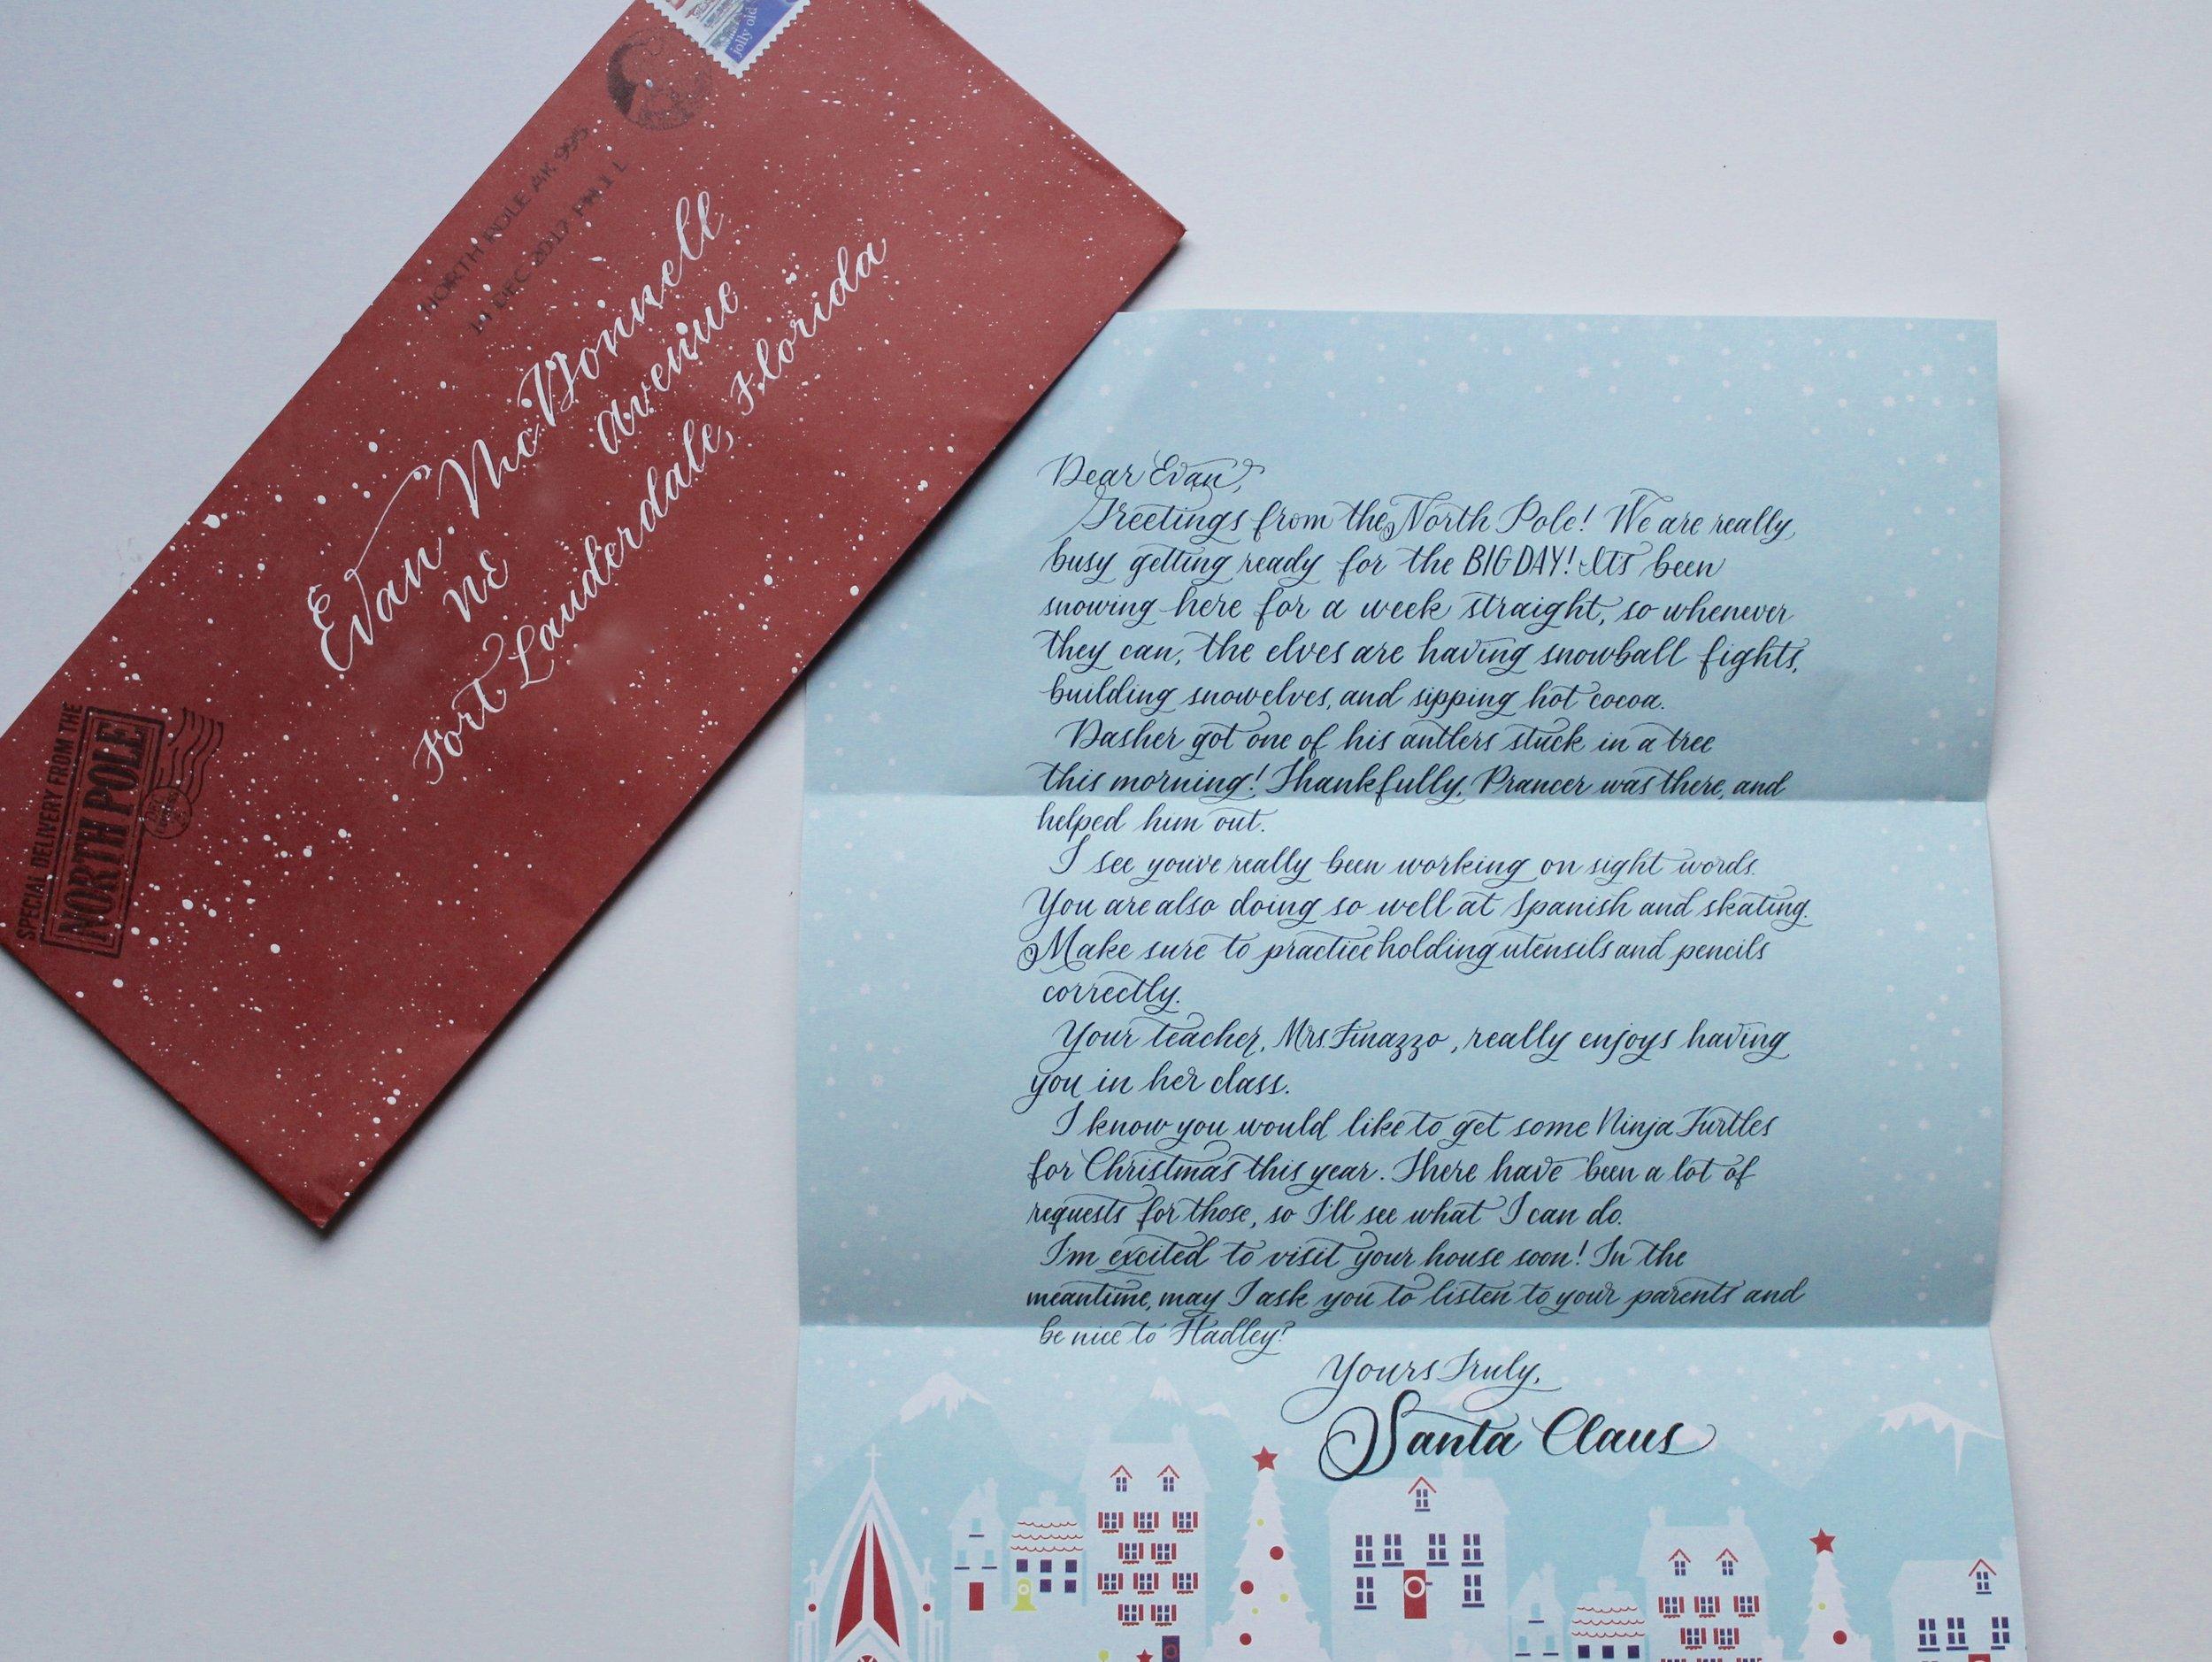 Evan's letter.